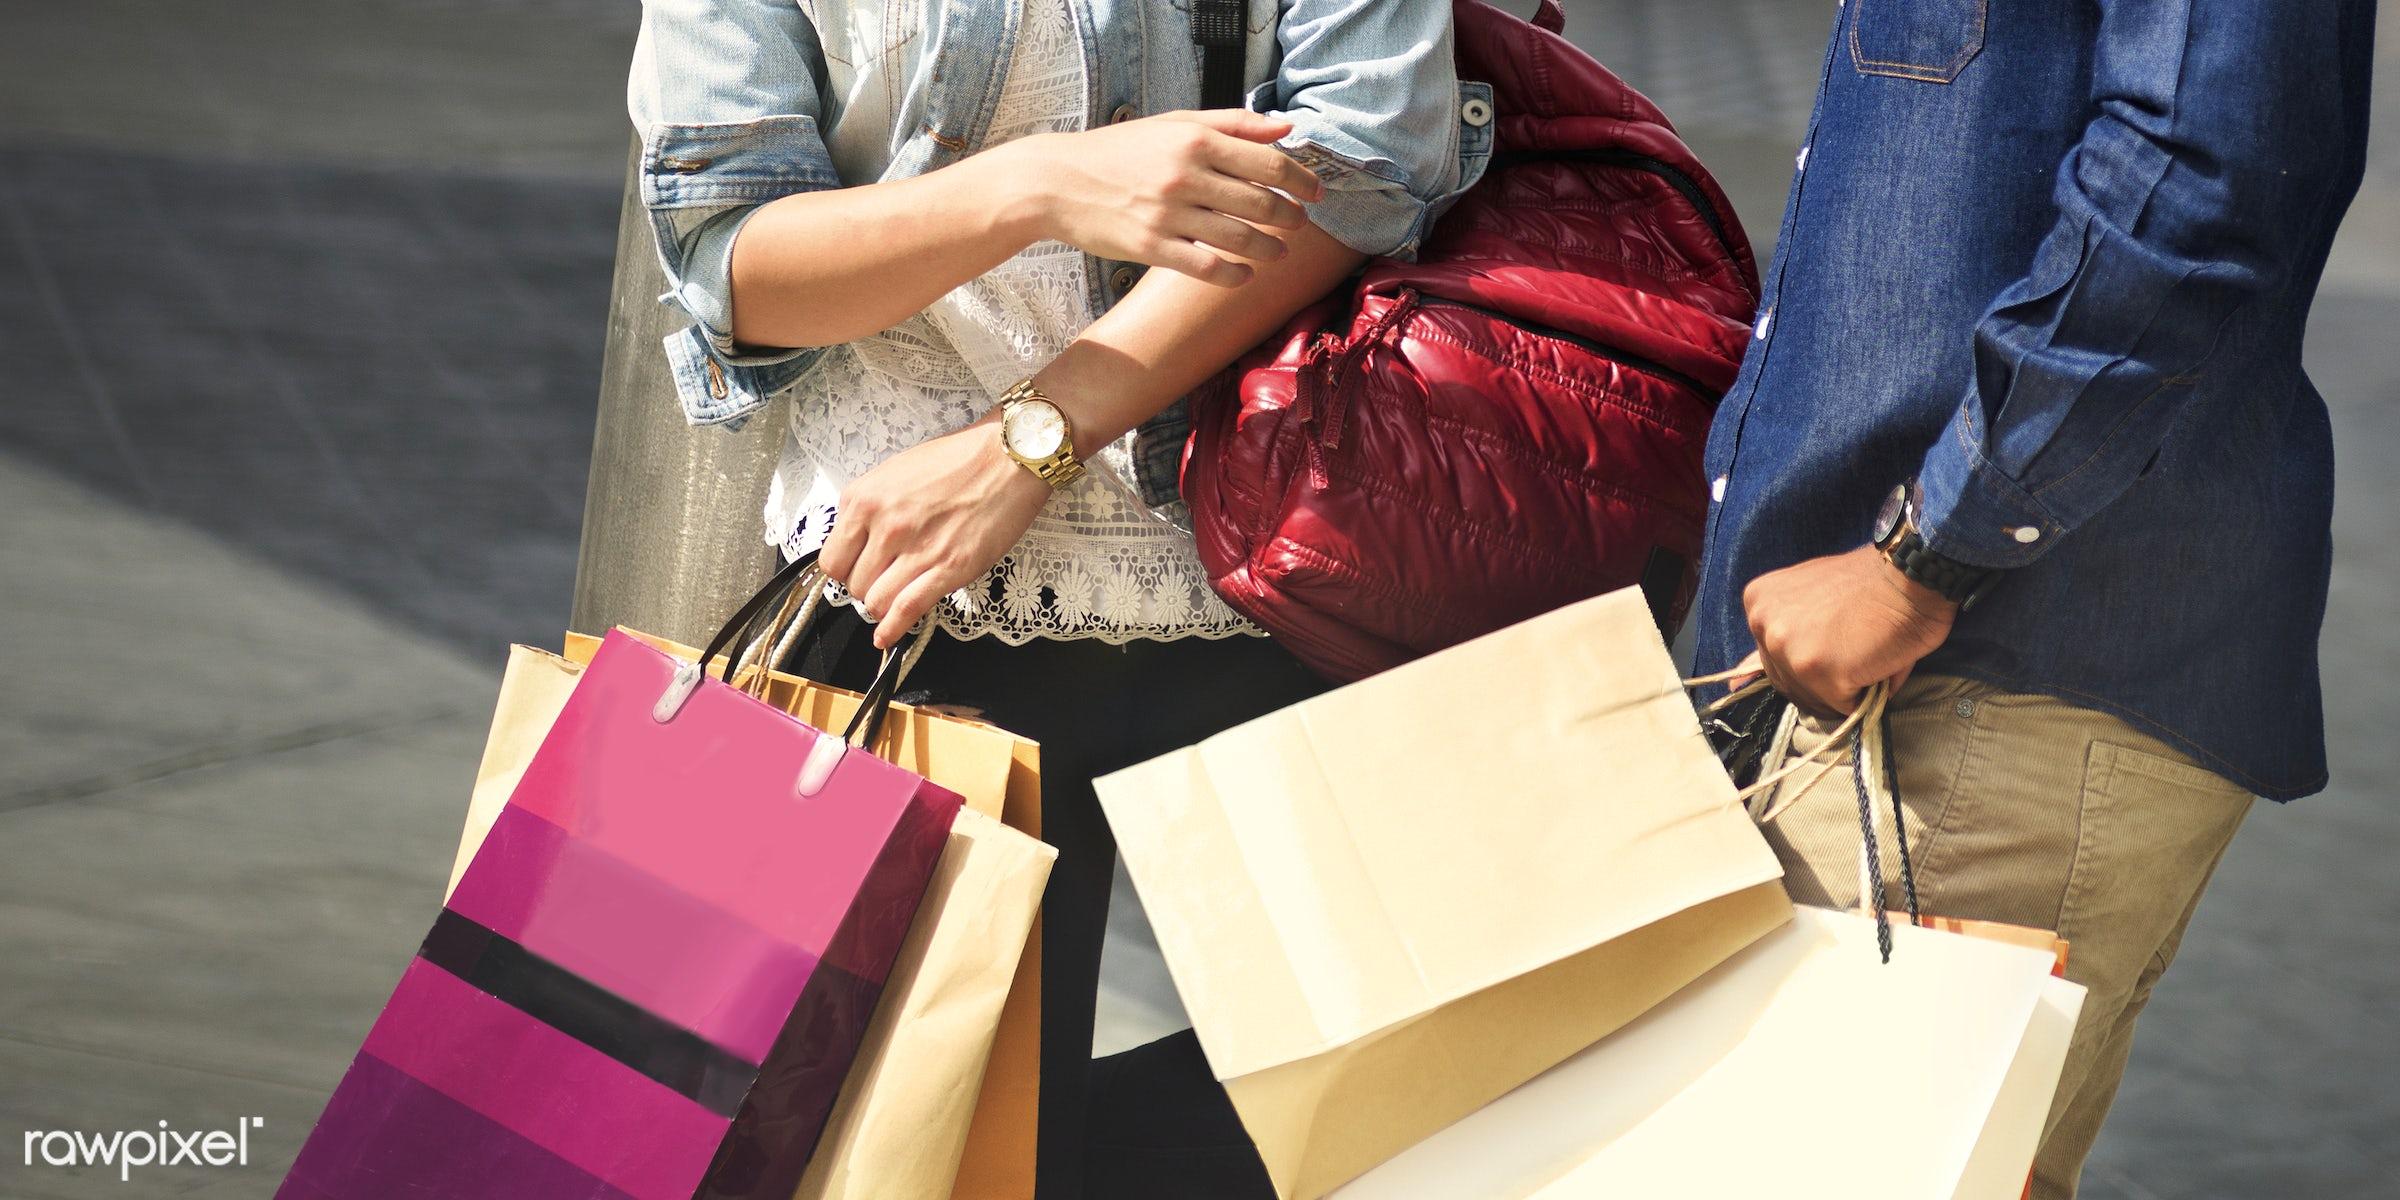 Friends shopping together - shop, shopping, man, woman, happy, fun, enjoy, enjoyment, together, bonding, happiness, friends...